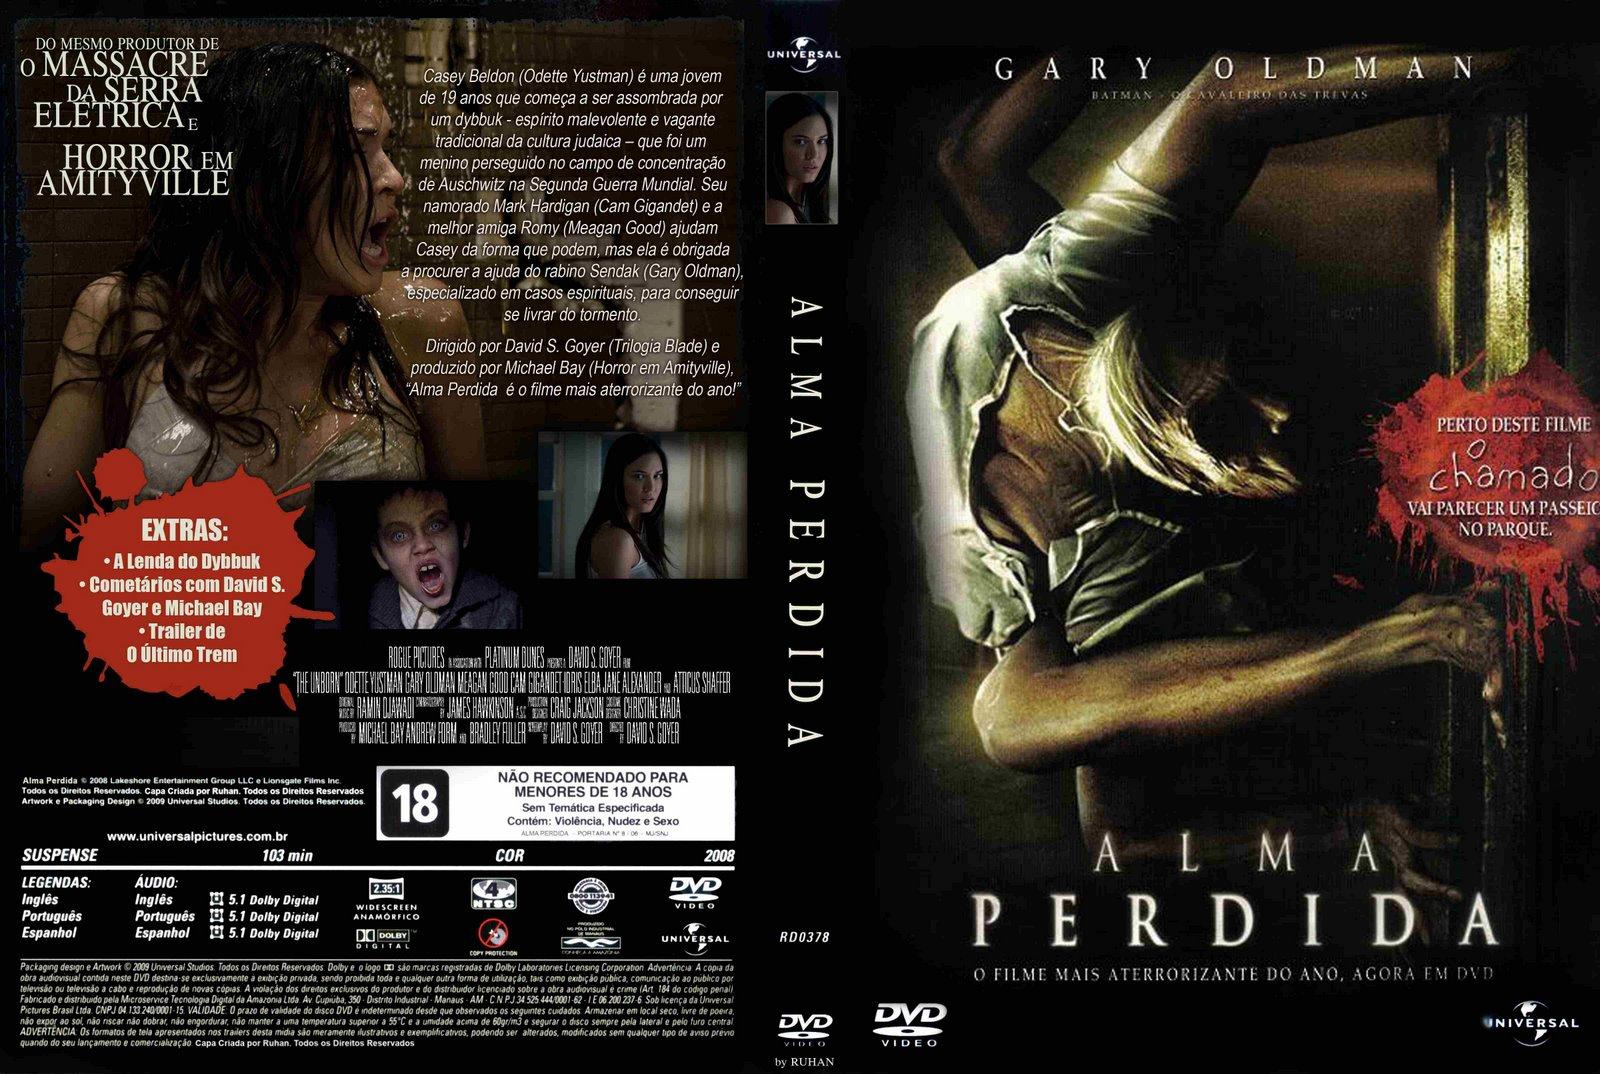 Filme Alma Perdida DVD Capa